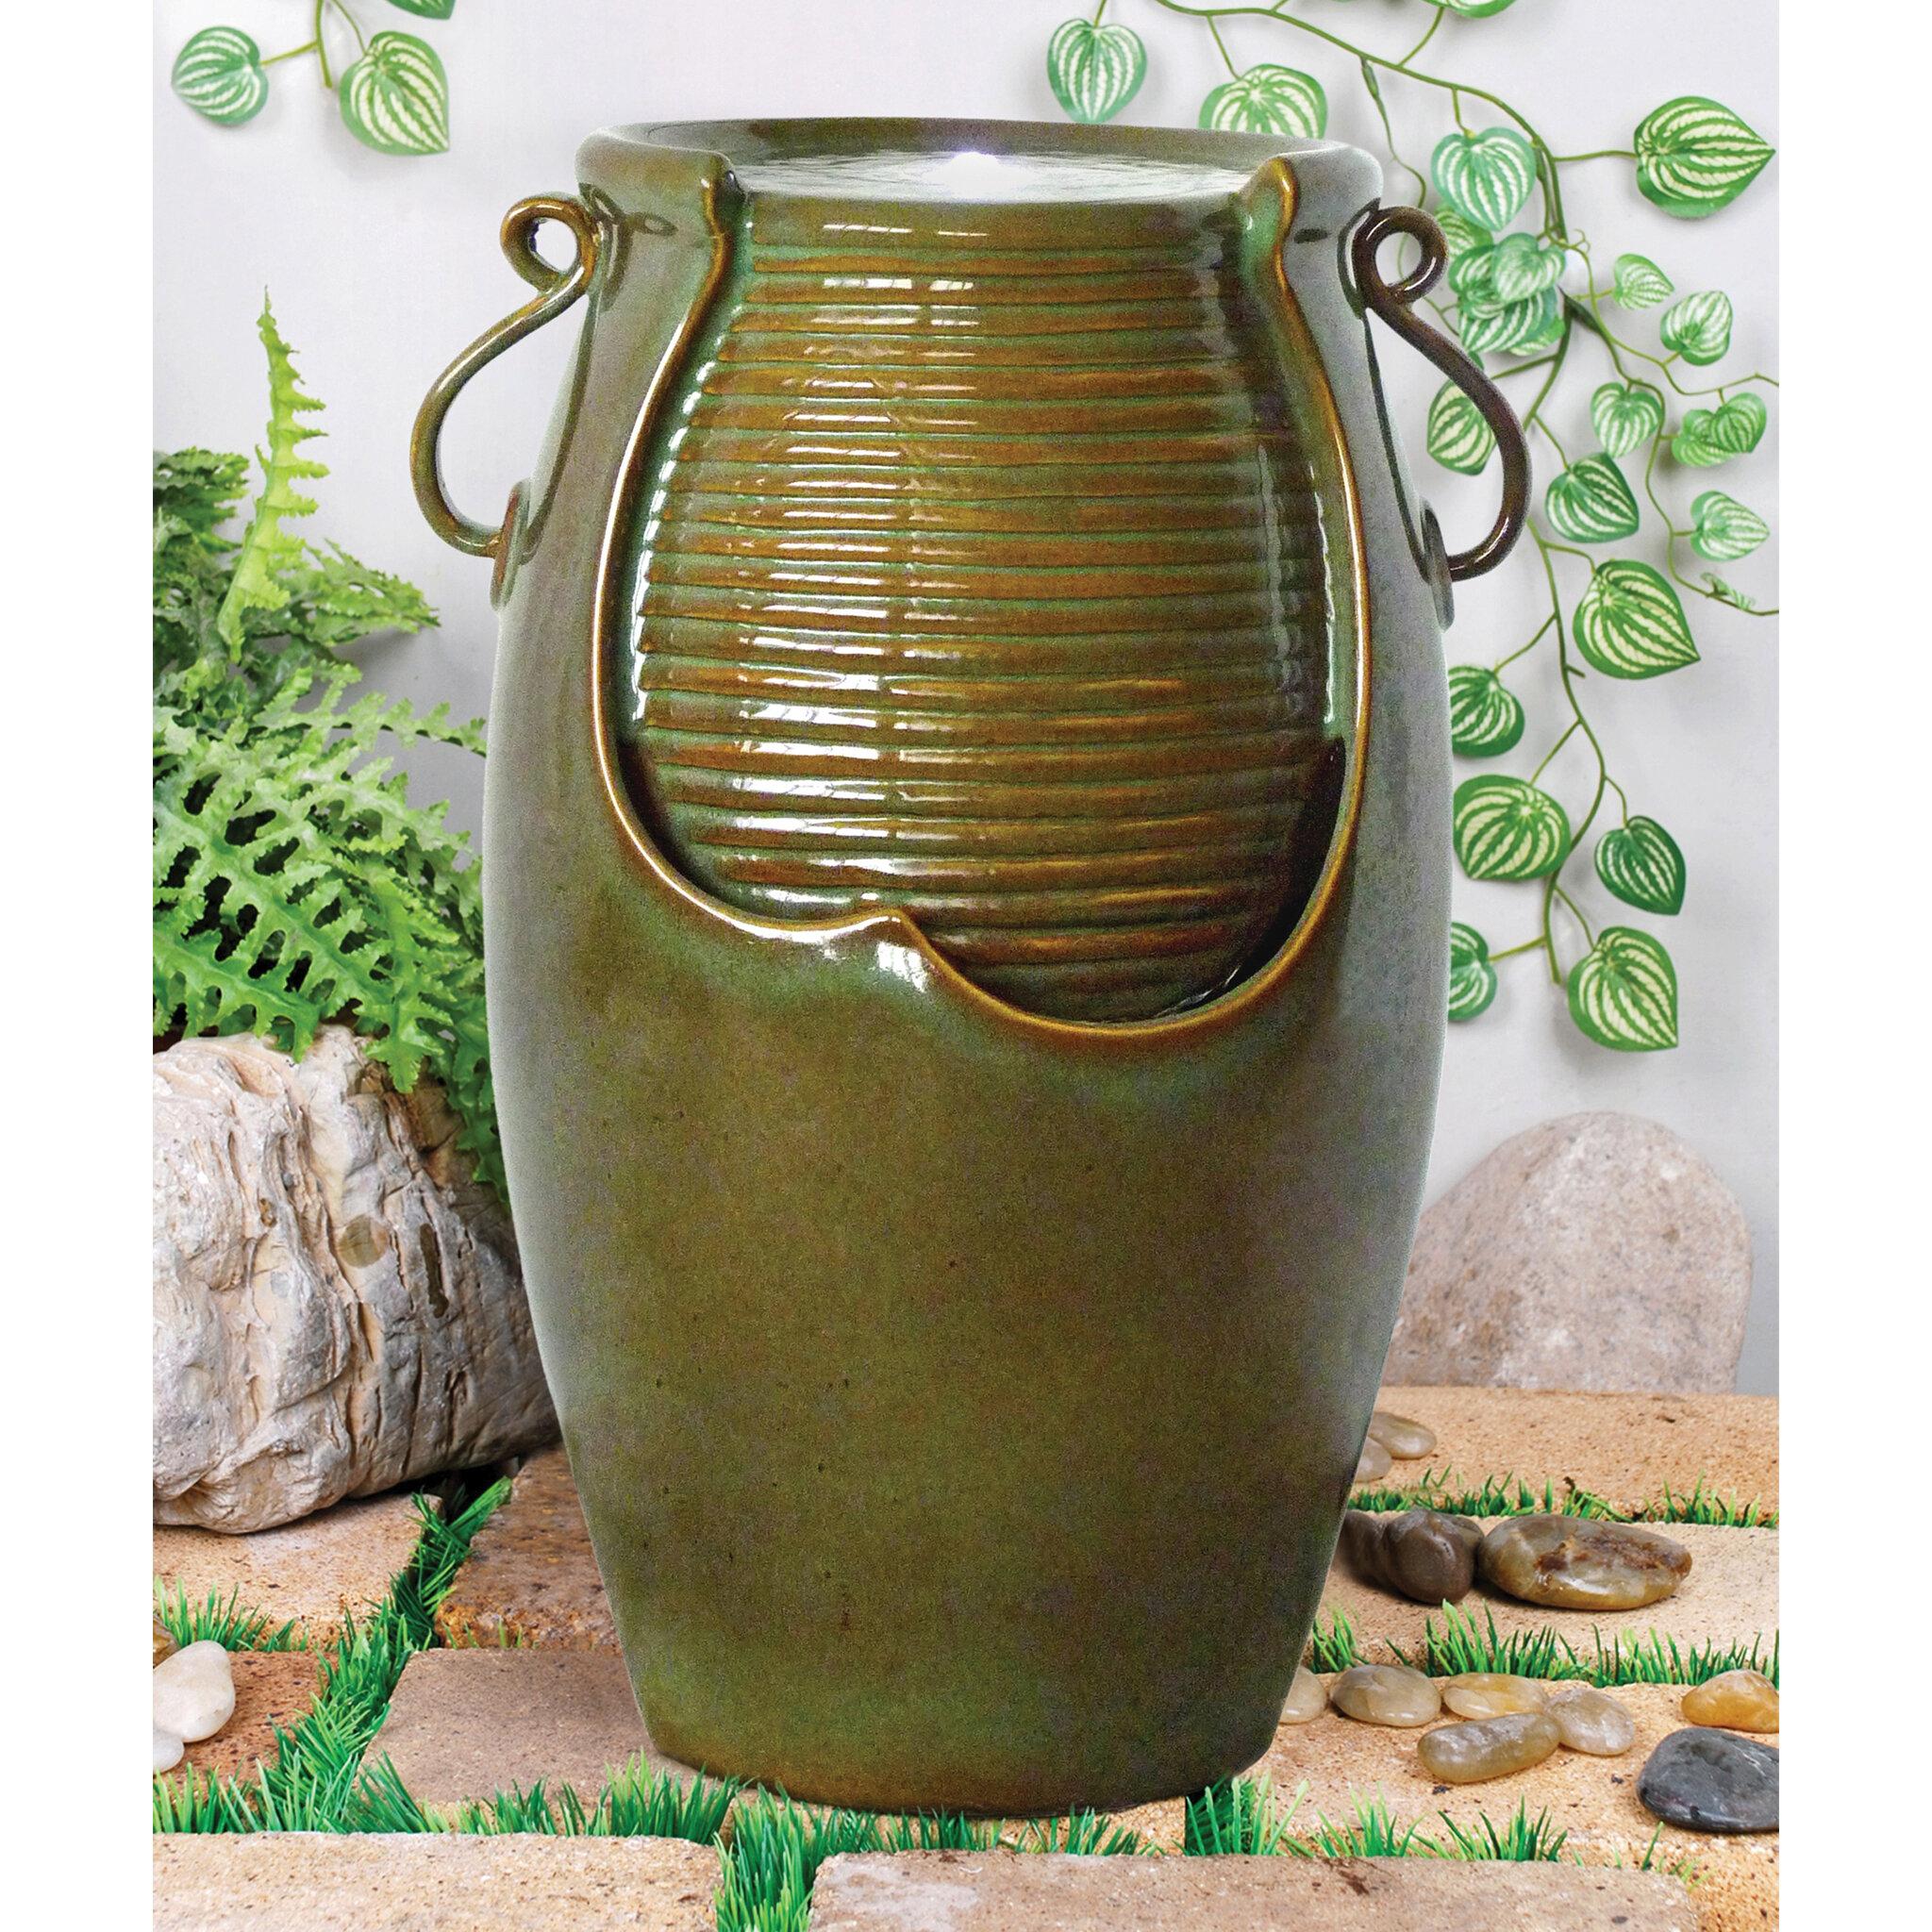 Wildon Home ® Ceramic Rippling Jar Garden Ceramic Urn Fountain with ...